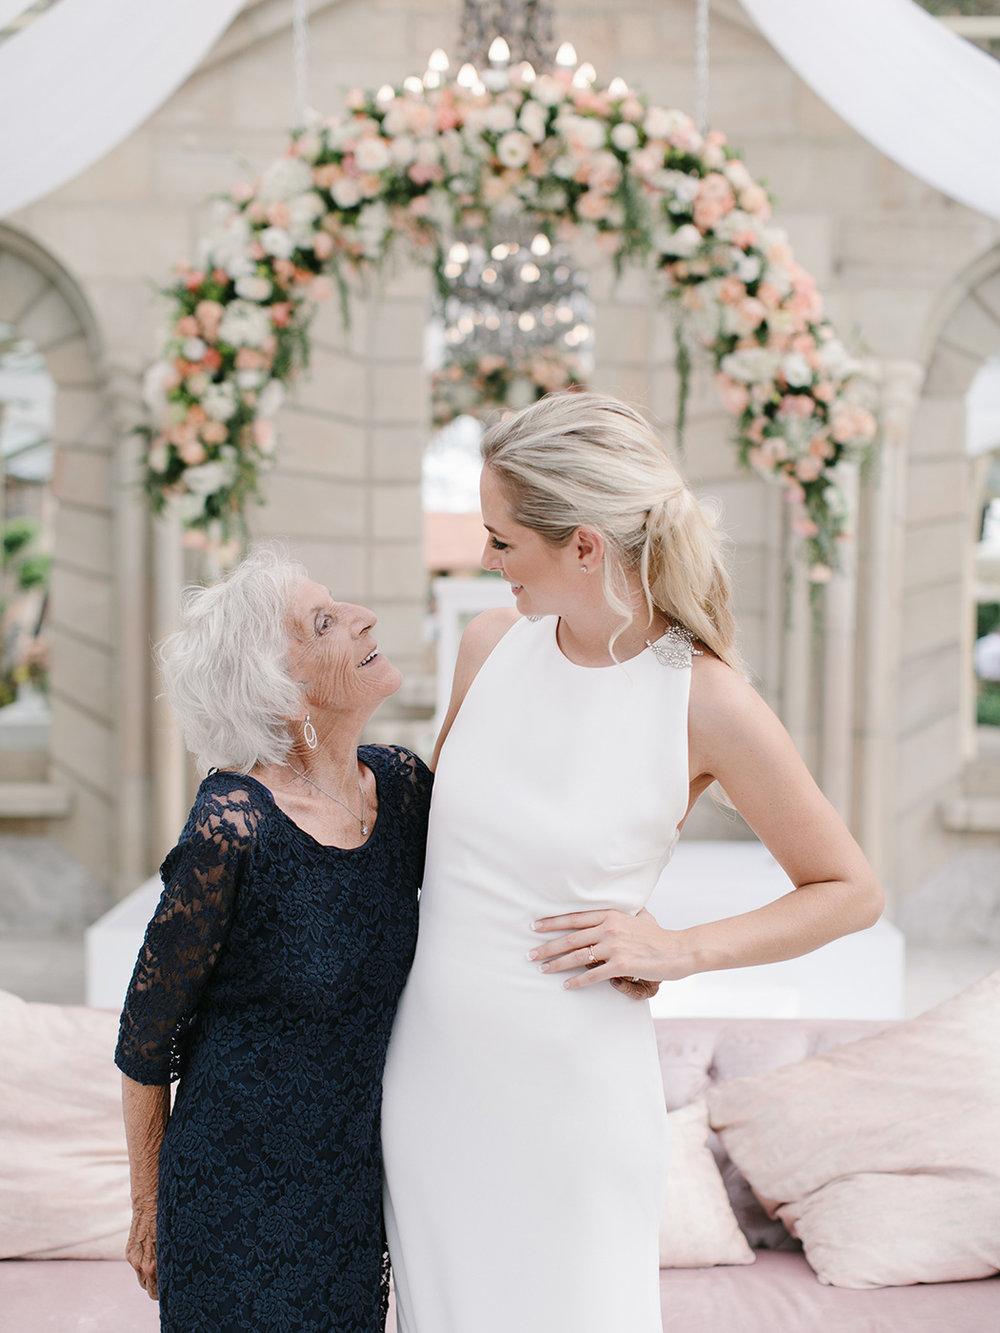 Grandma & Bride | Rensche Mari Photography